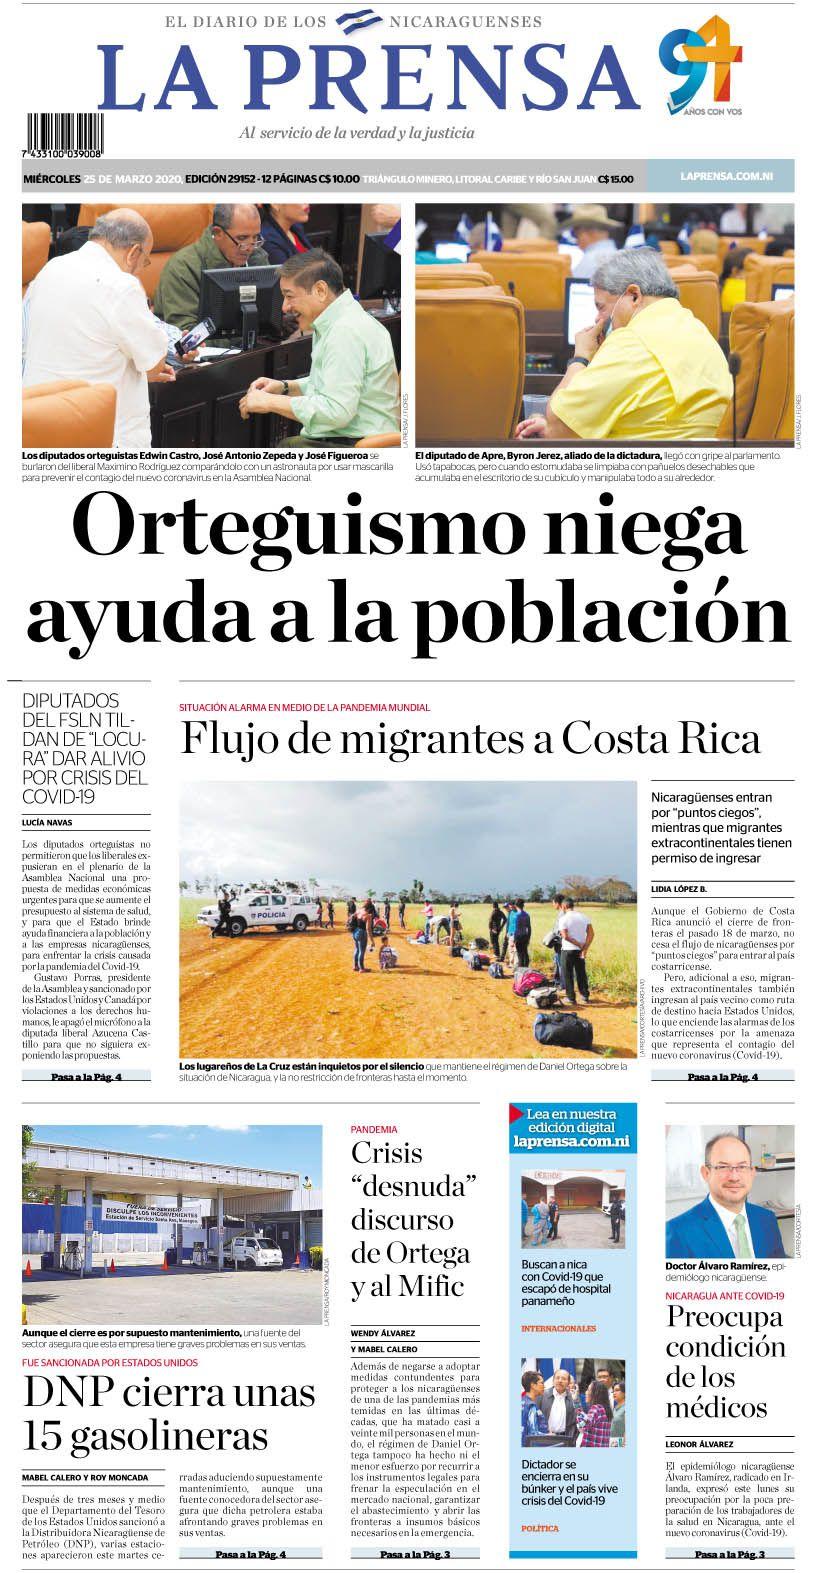 Caricatura 25 3 2020 Nicaragua Noticias